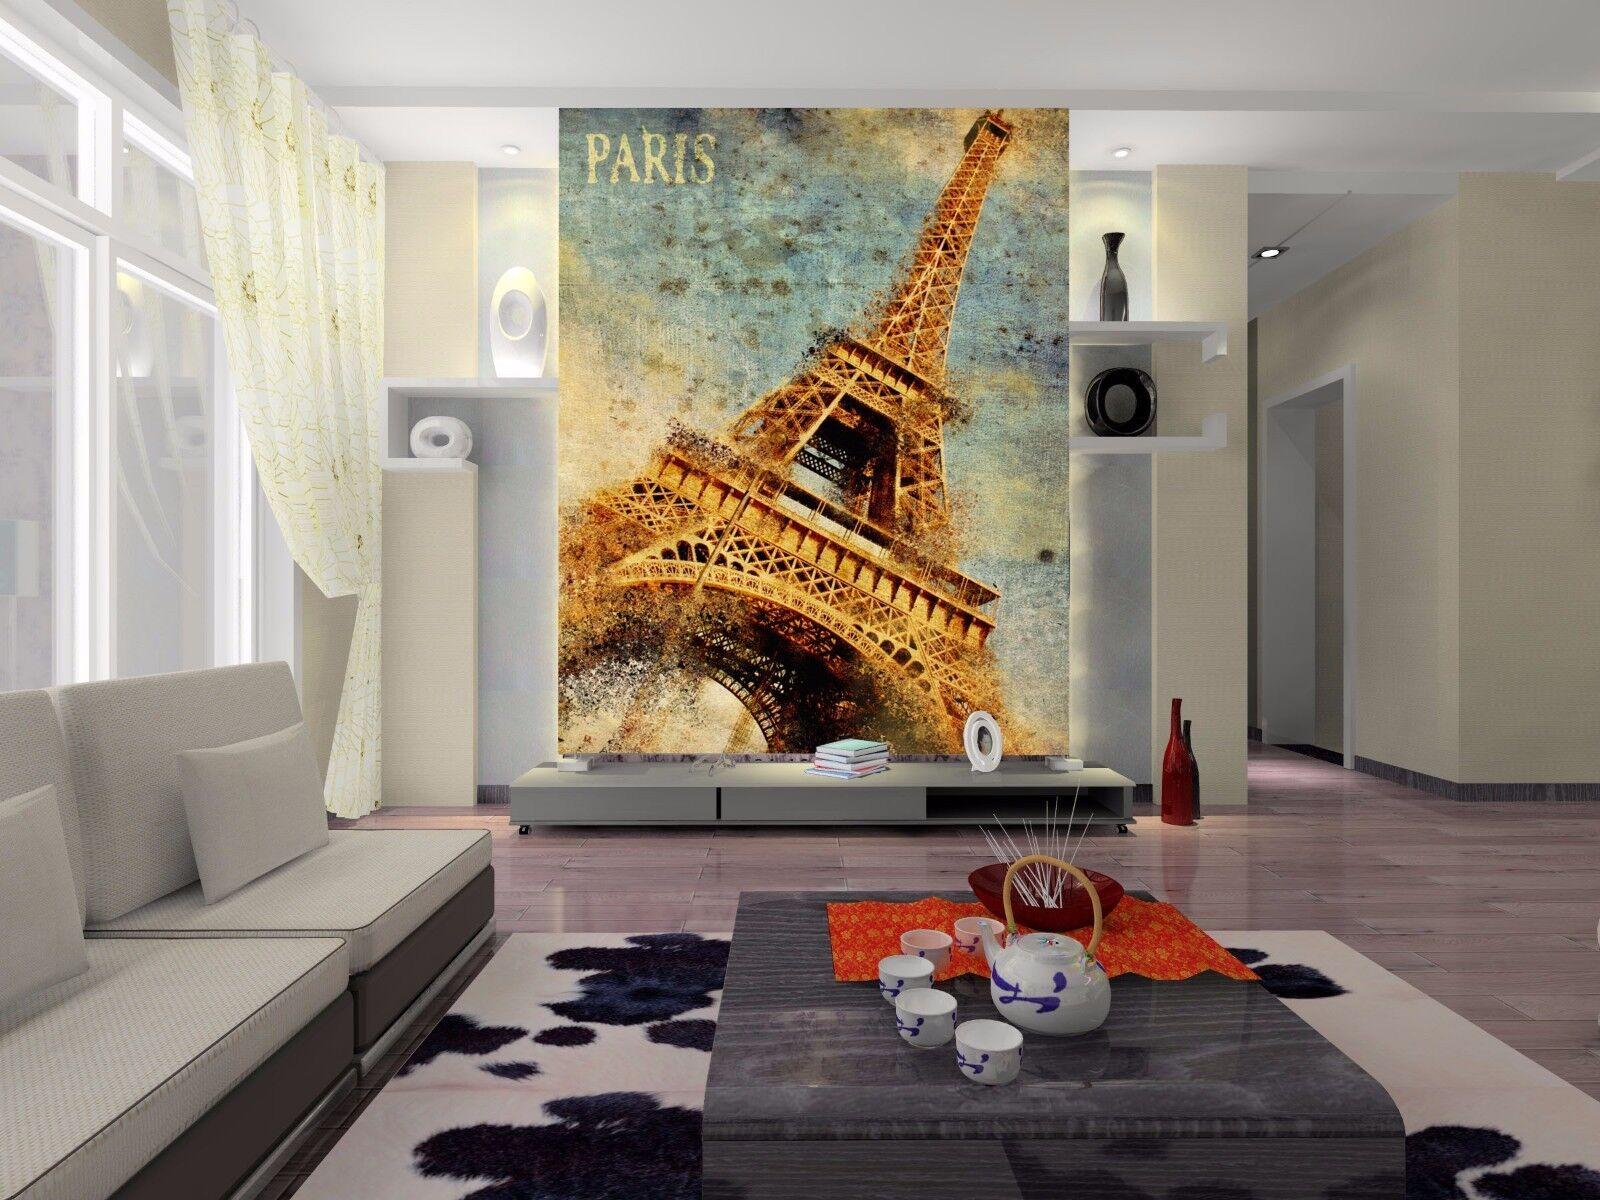 3D Eiffel Tower 1096 WallPaper Murals Wall Print Decal Wall Deco AJ WALLPAPER